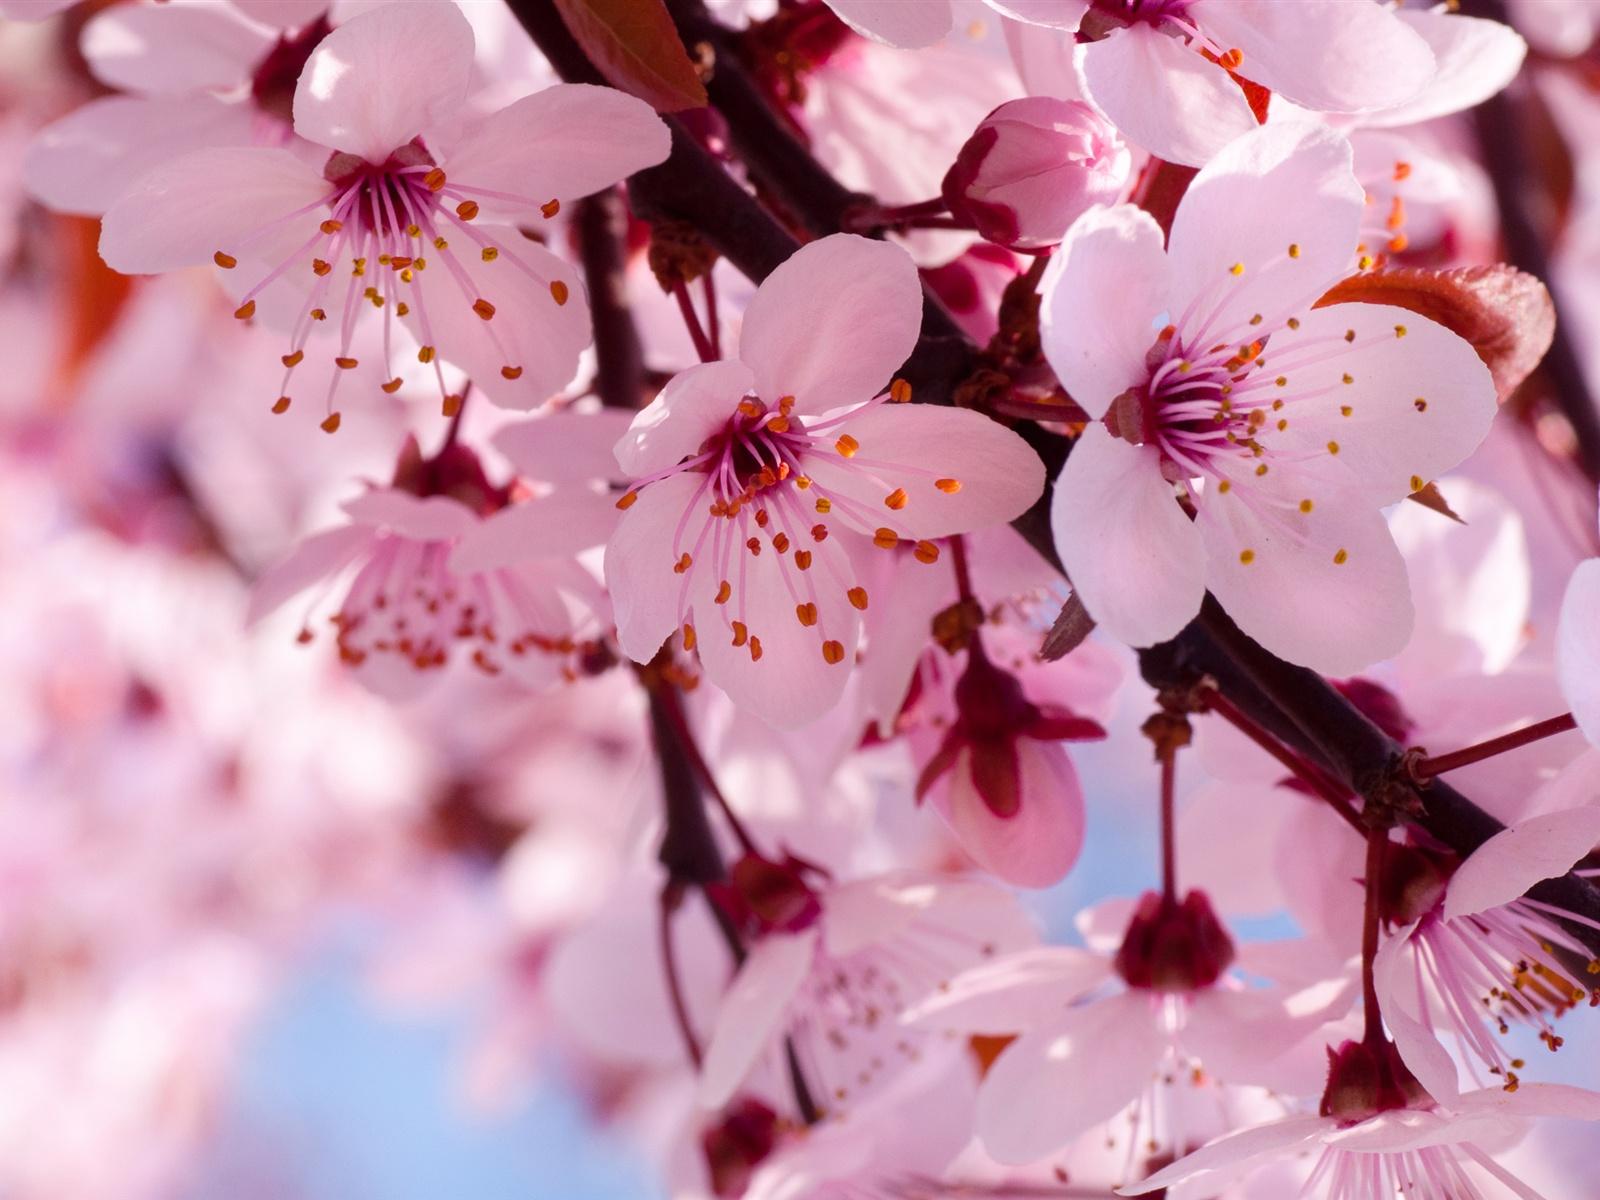 Pink Cherry Blossom   Flowers Photo 34658308 1600x1200